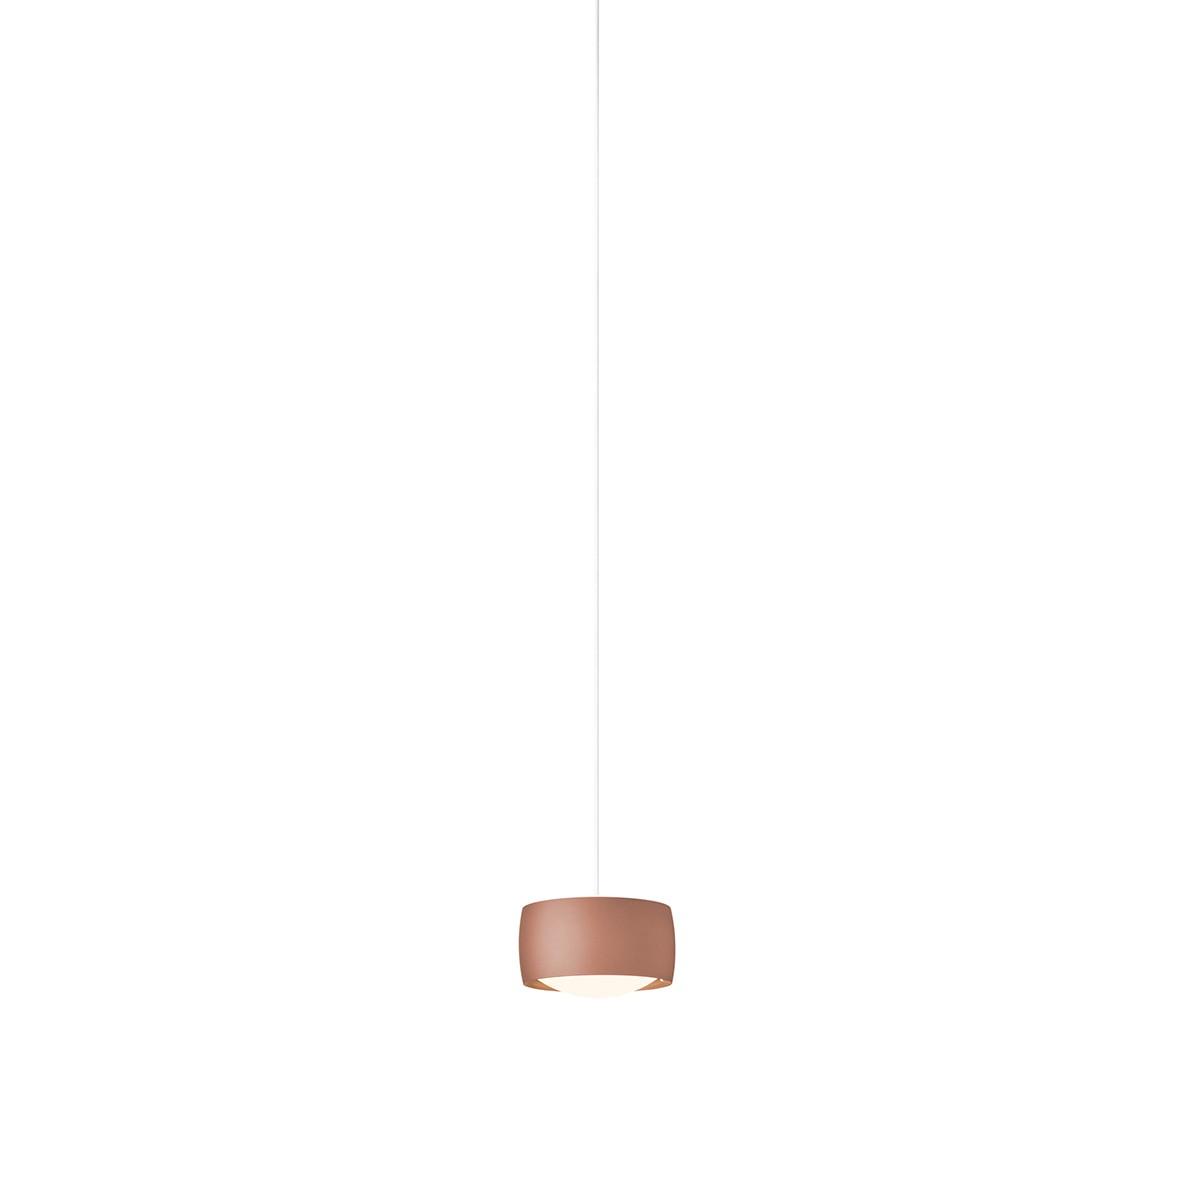 Oligo CHECK-IN Grace LED Pendelleuchte, Satin copper, Adapter: Chrom